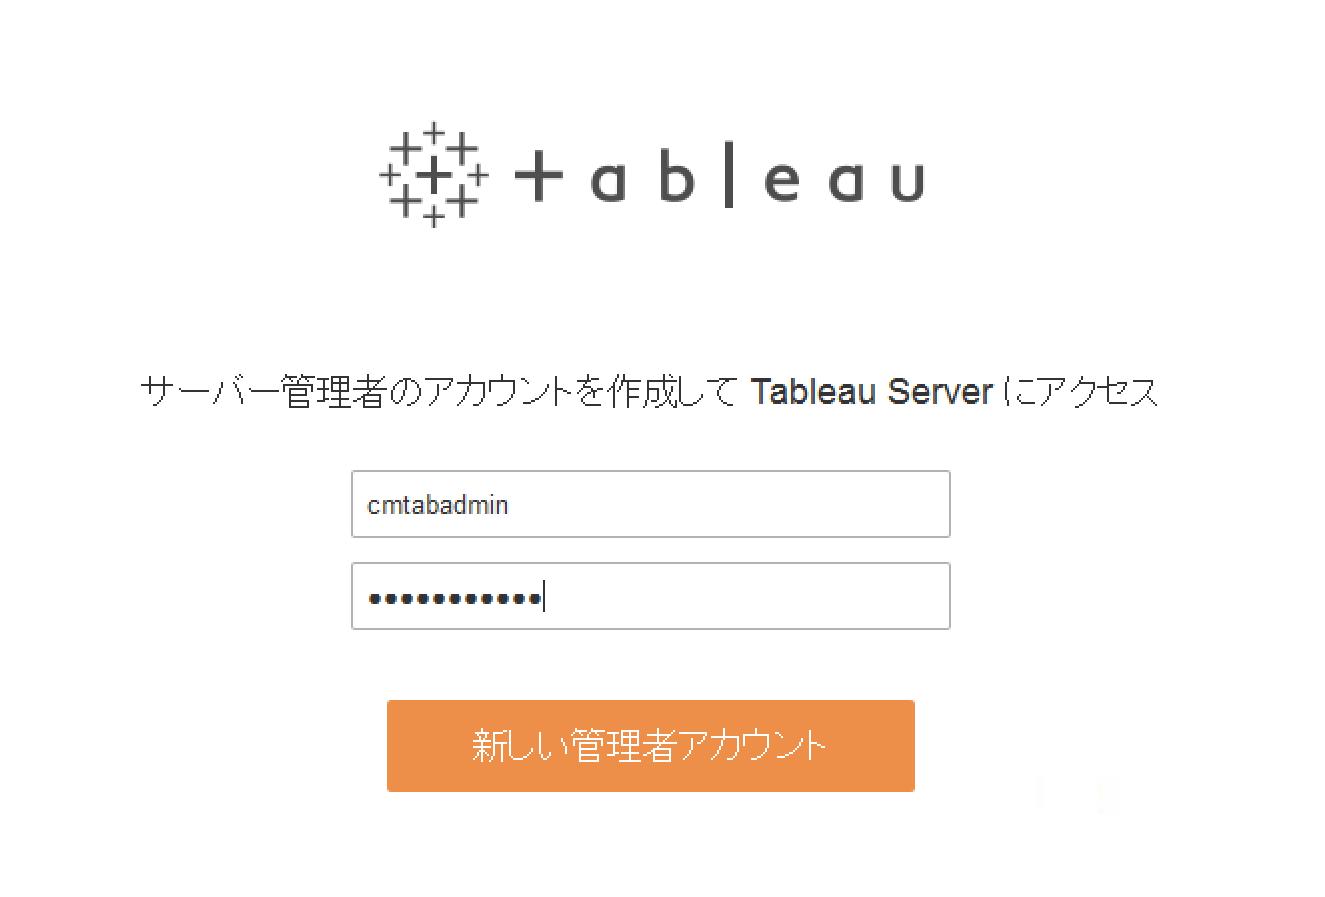 tabsv10-ad_13